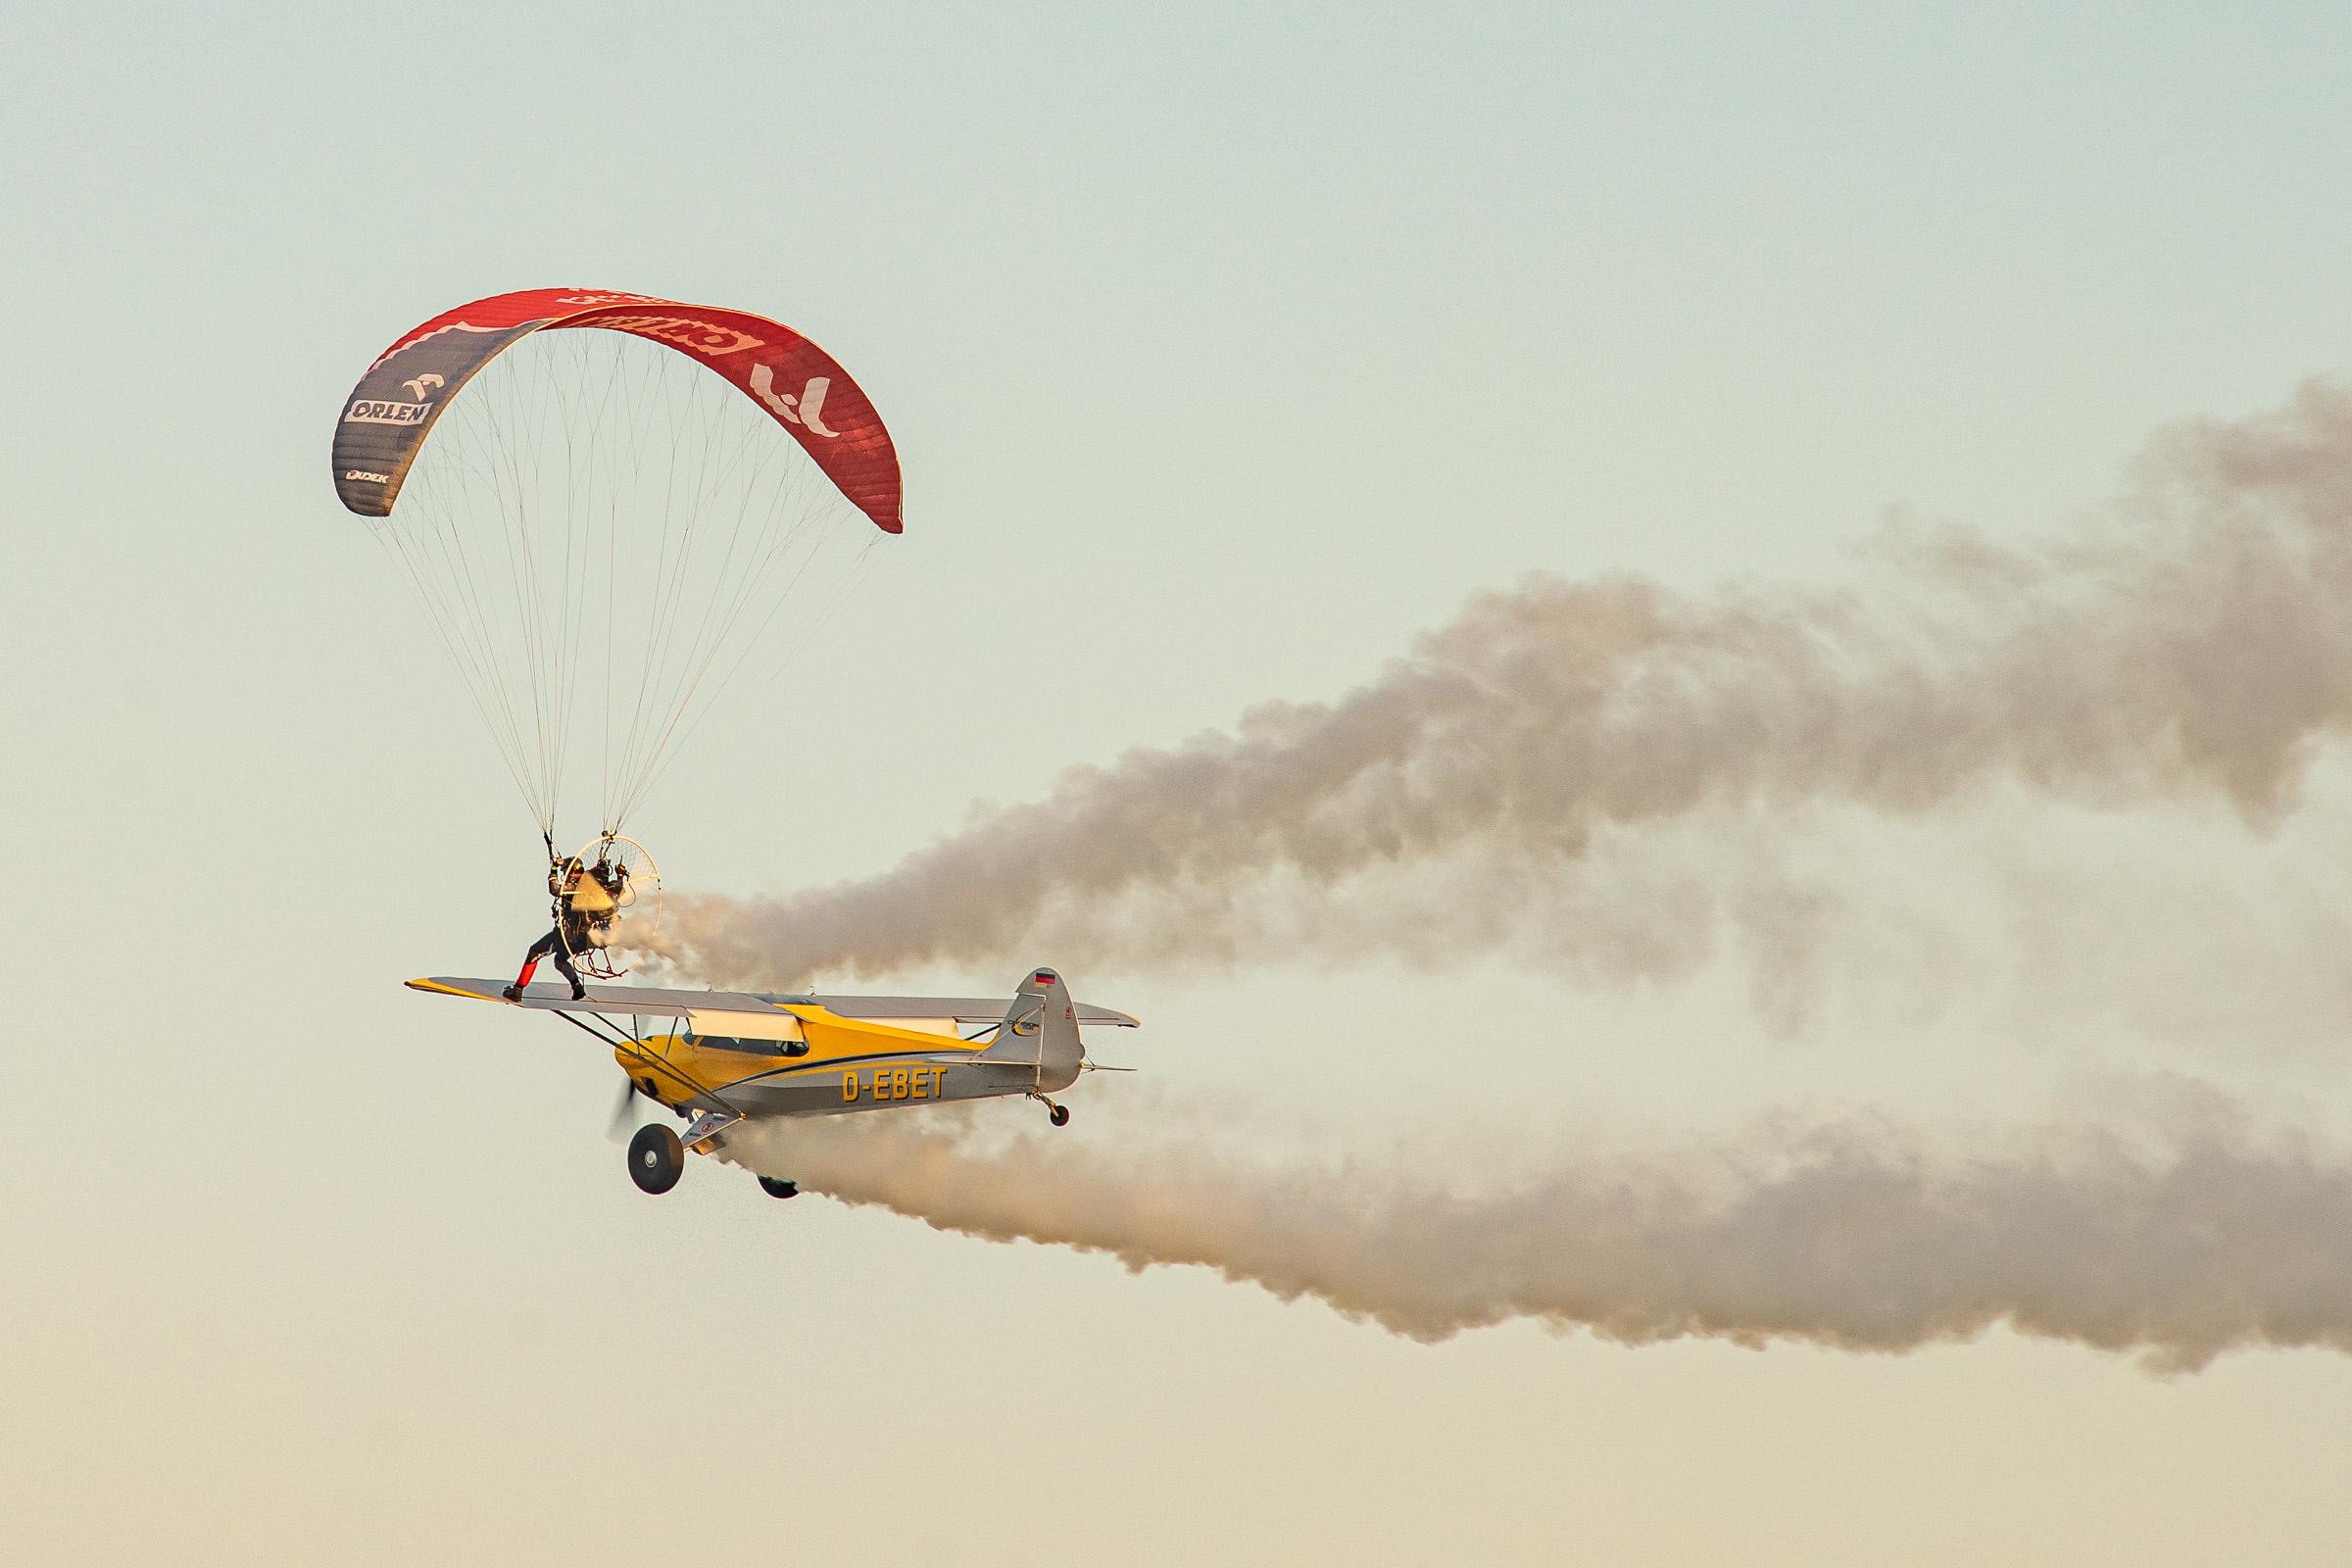 Wojciech Bogdal stojacy na skrzydle samolotu. Fot. Michal Bosek